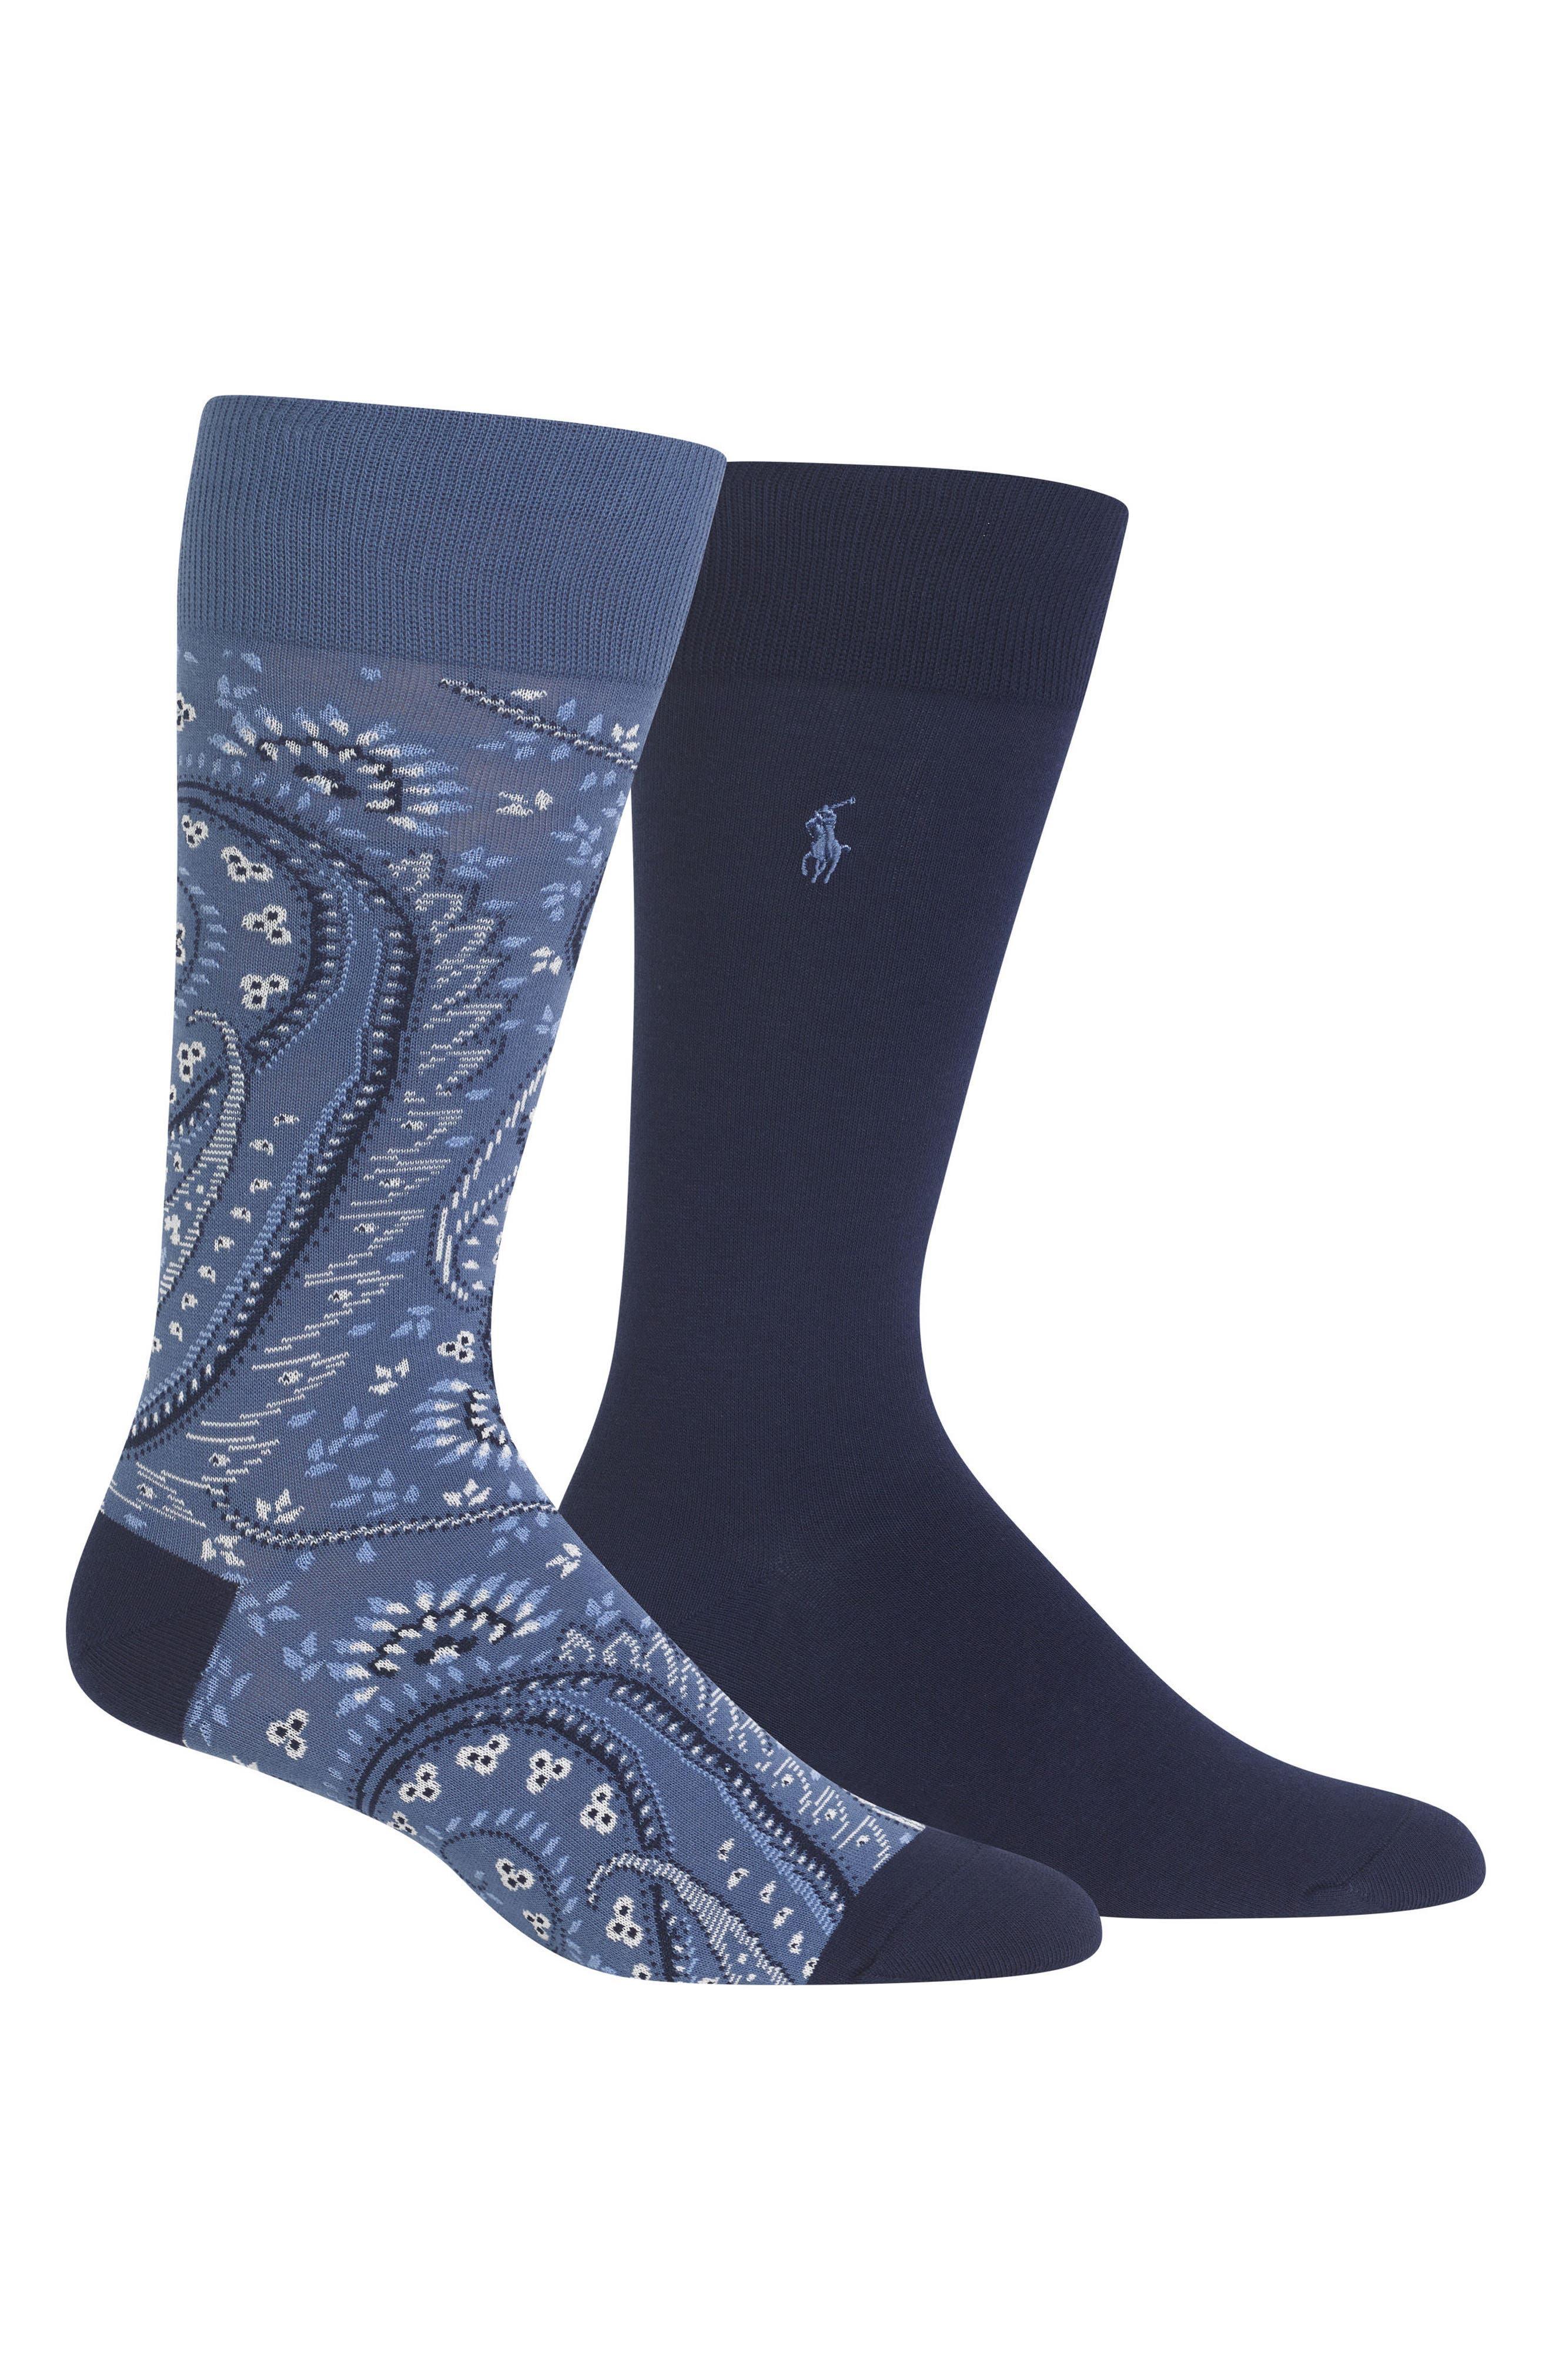 2-Pack Socks,                         Main,                         color, Blue